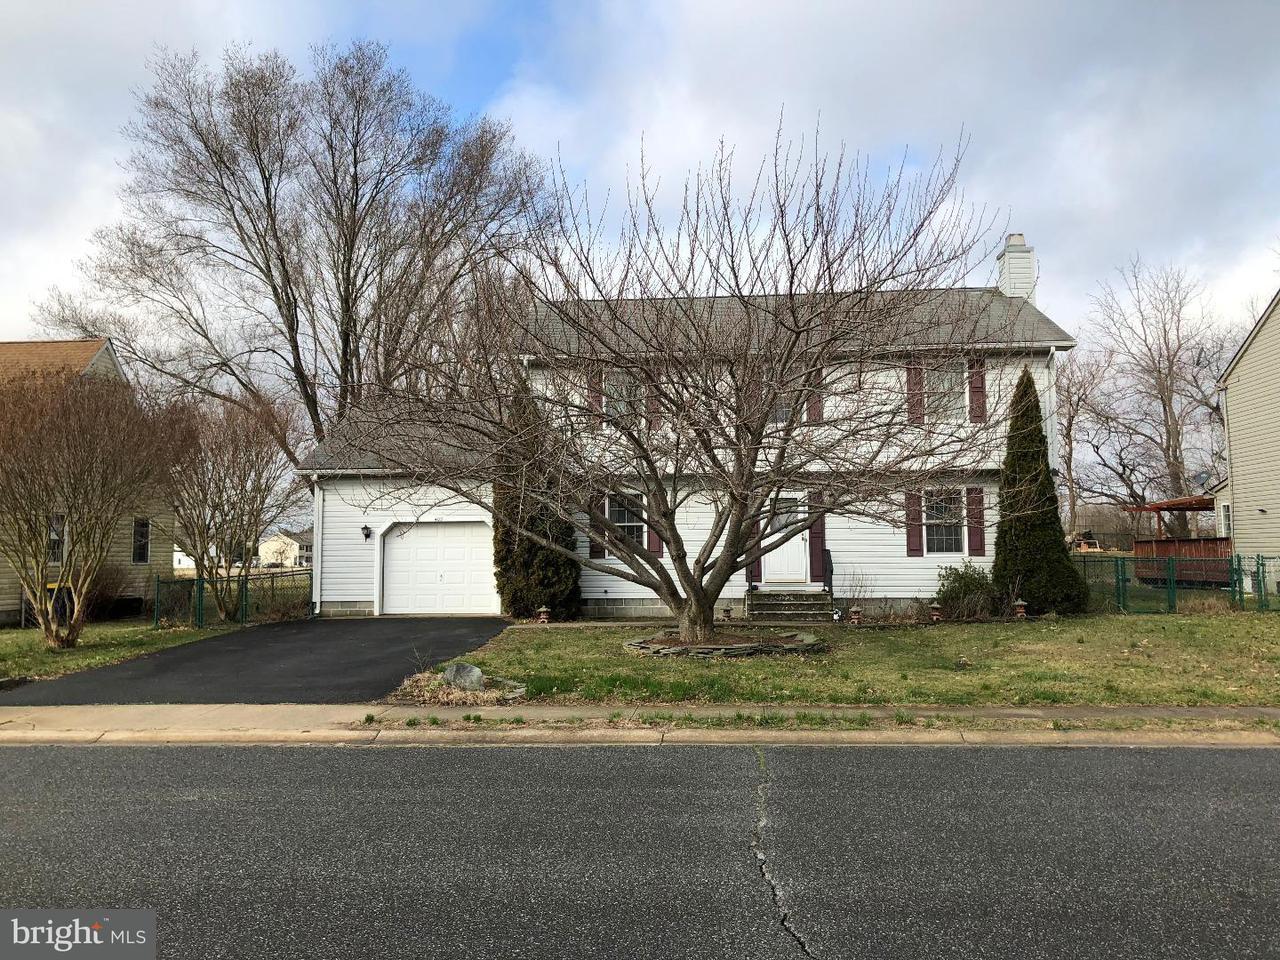 Single Family Home for Rent at 409 RYAN Court Felton, Delaware 19943 United States